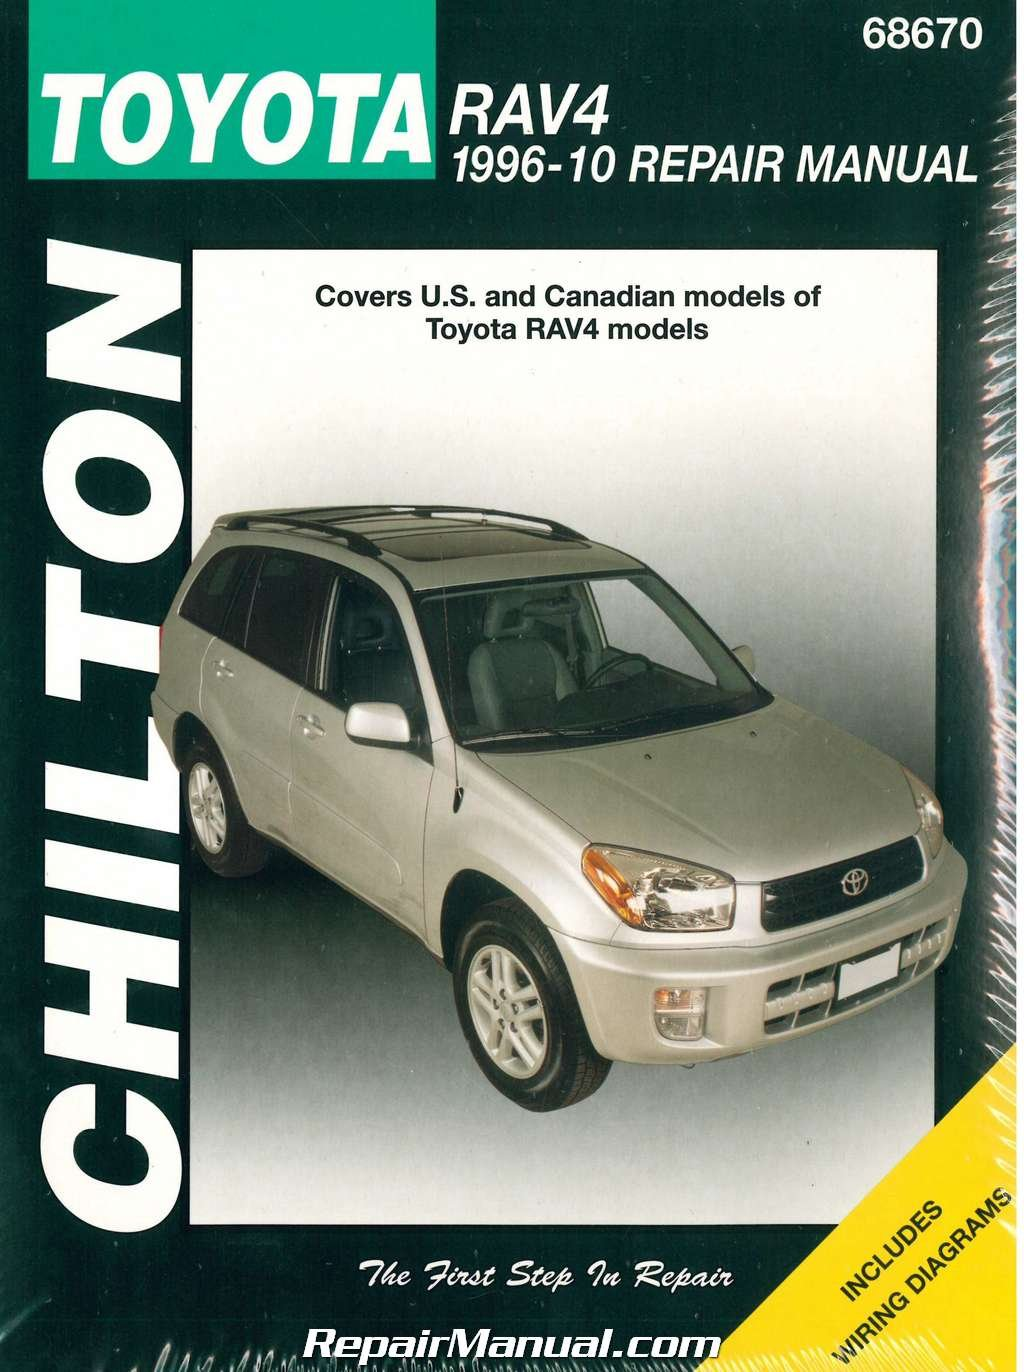 CH68670 Chilton Toyota RAV4 1996-2010 Repair Manual: Manufacturer:  Amazon.com: Books